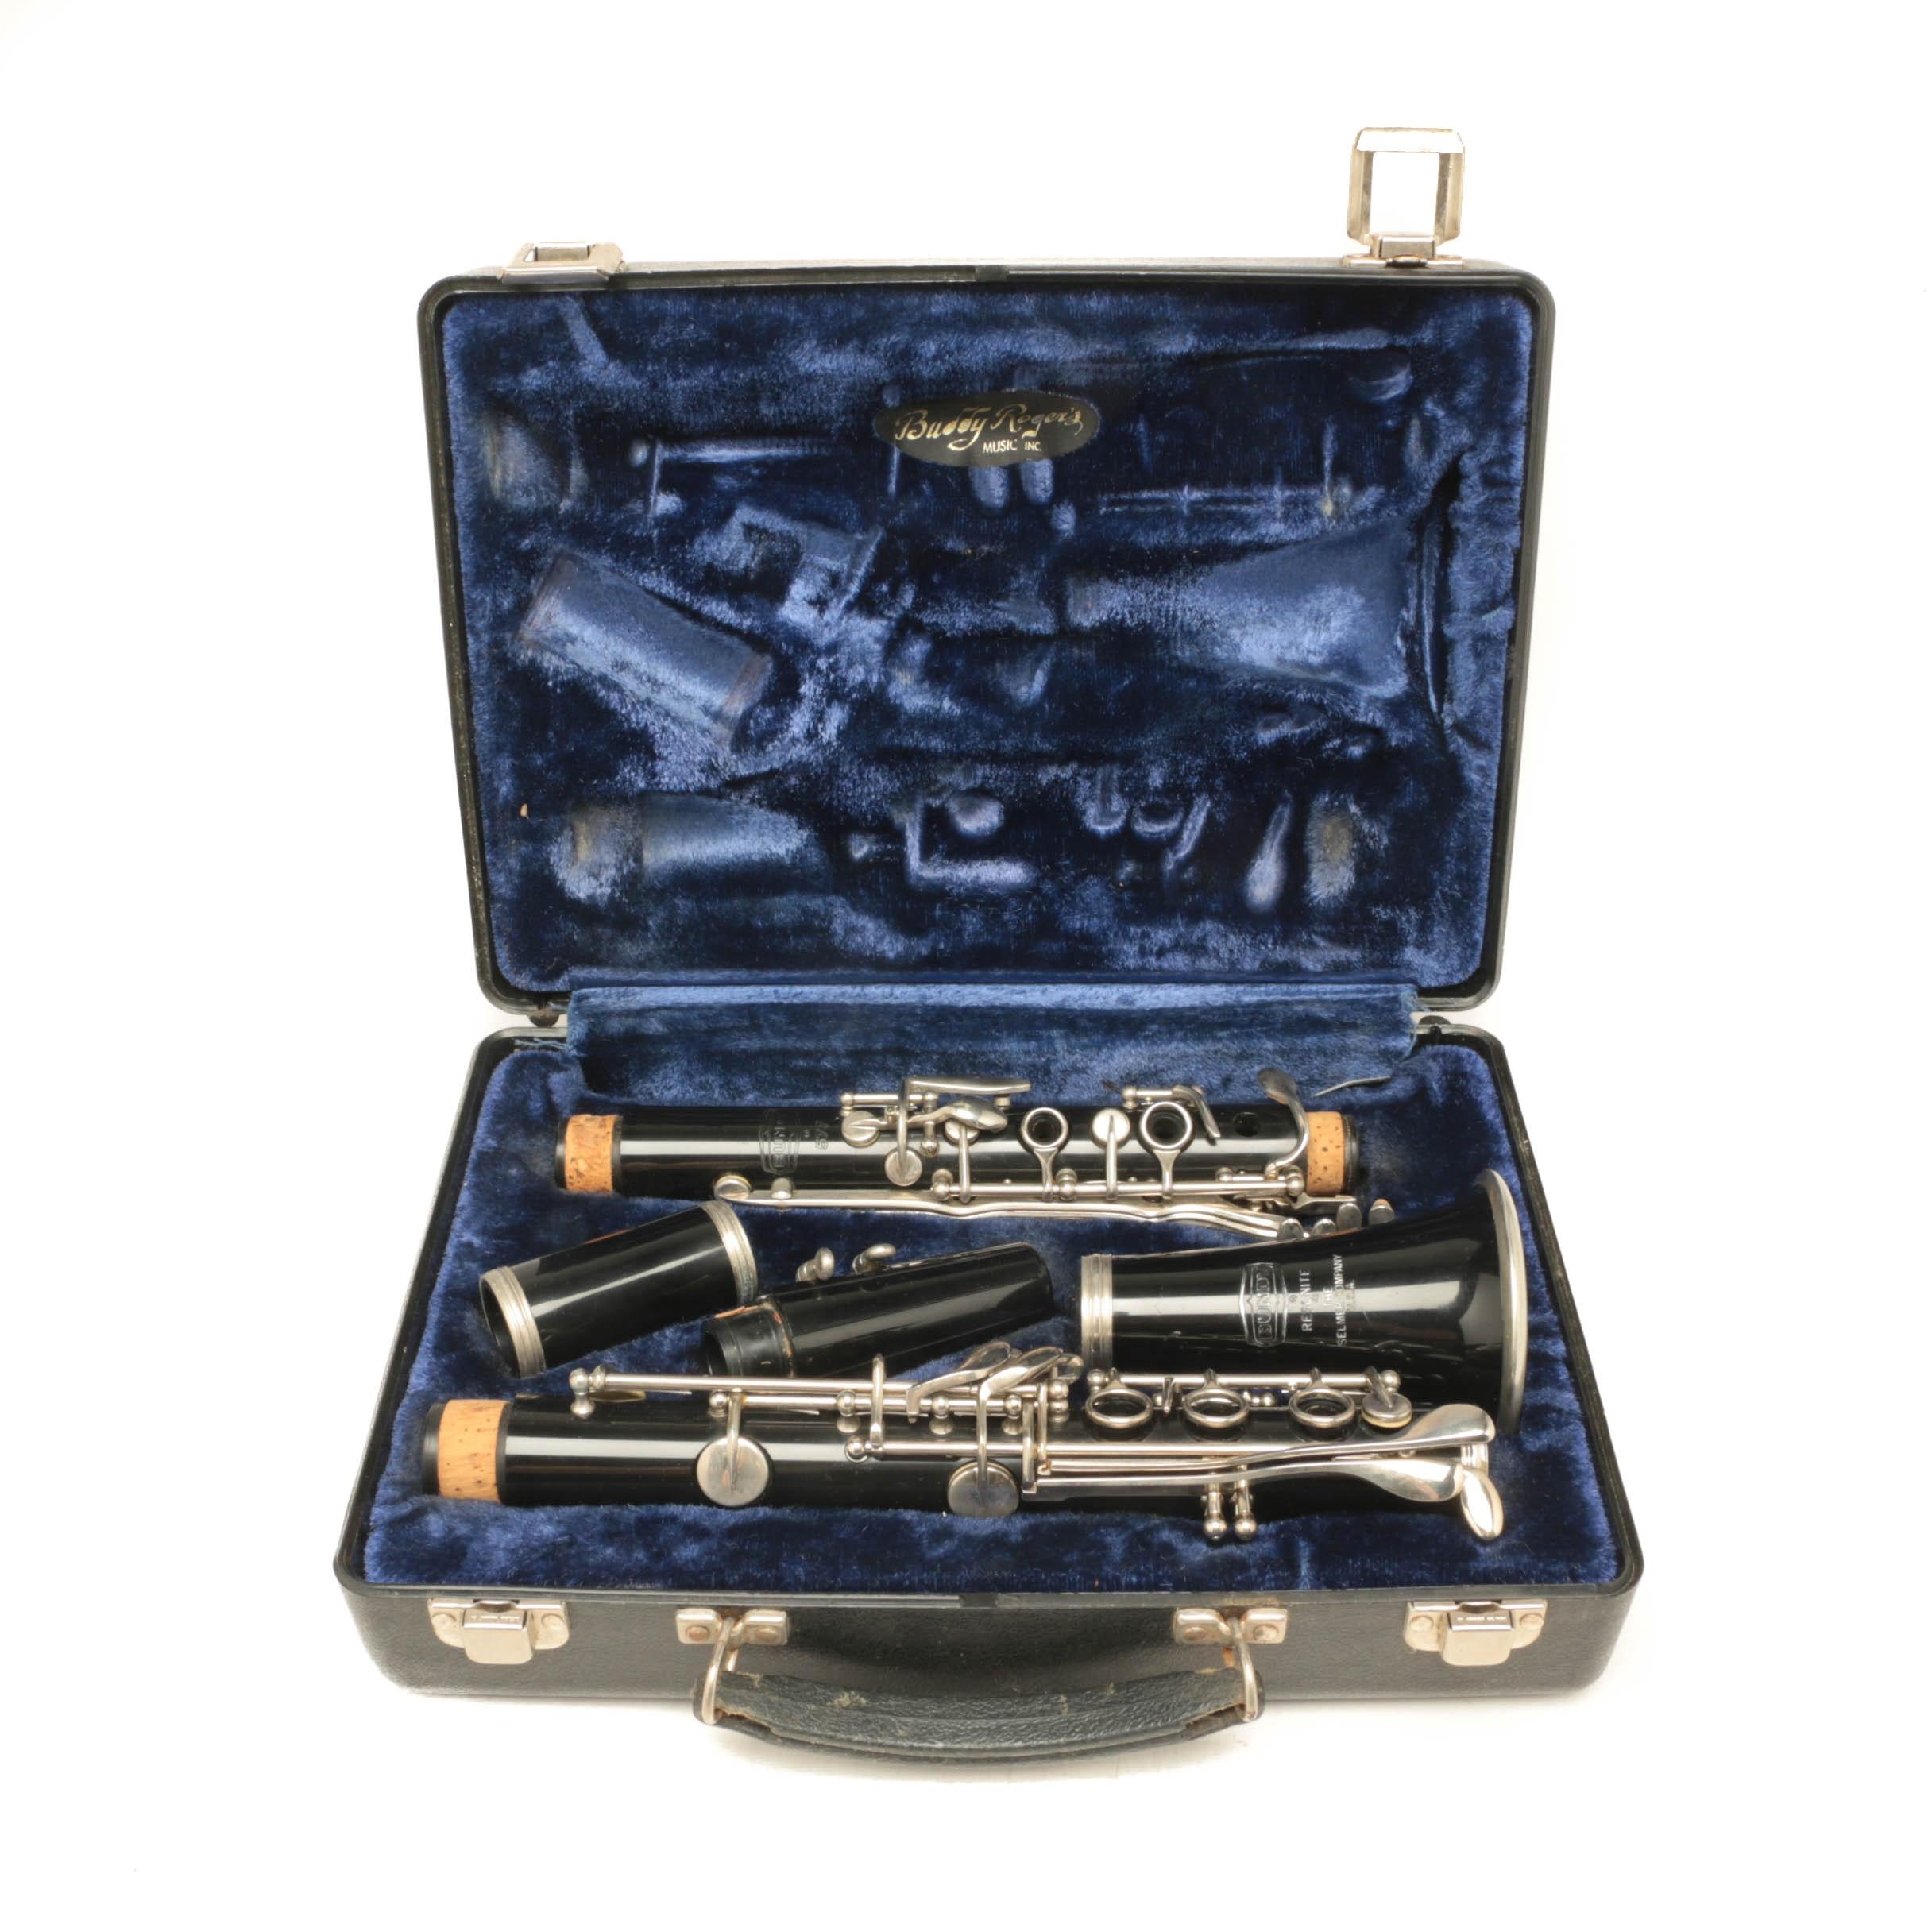 Bundy Clarinet by The Selmer Company